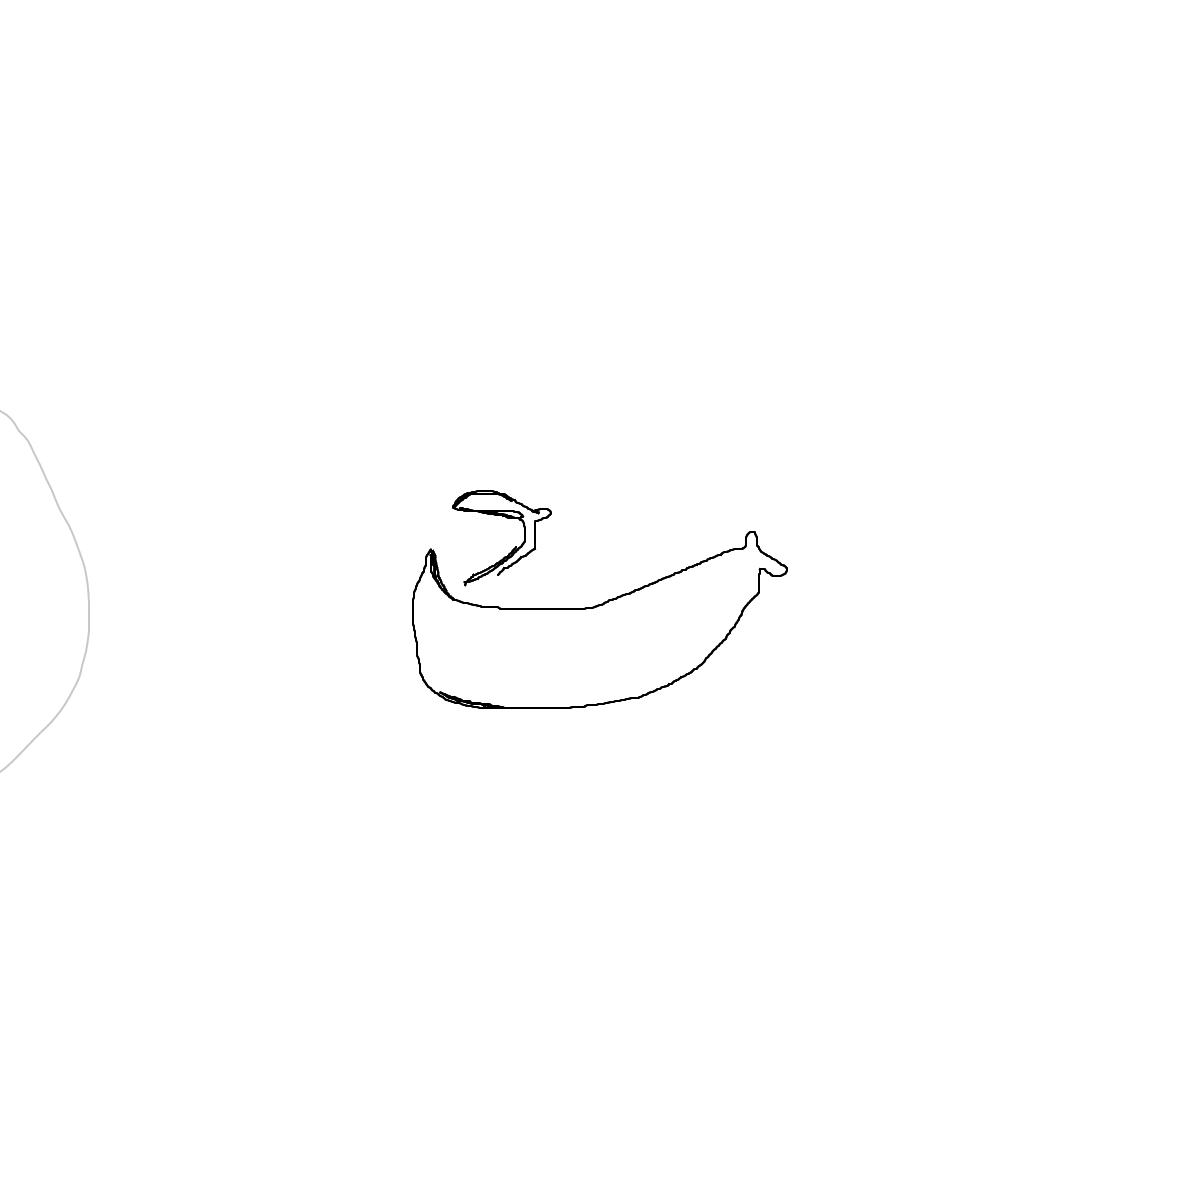 BAAAM drawing#23673 lat:48.8126754760742200lng: 2.3849215507507324